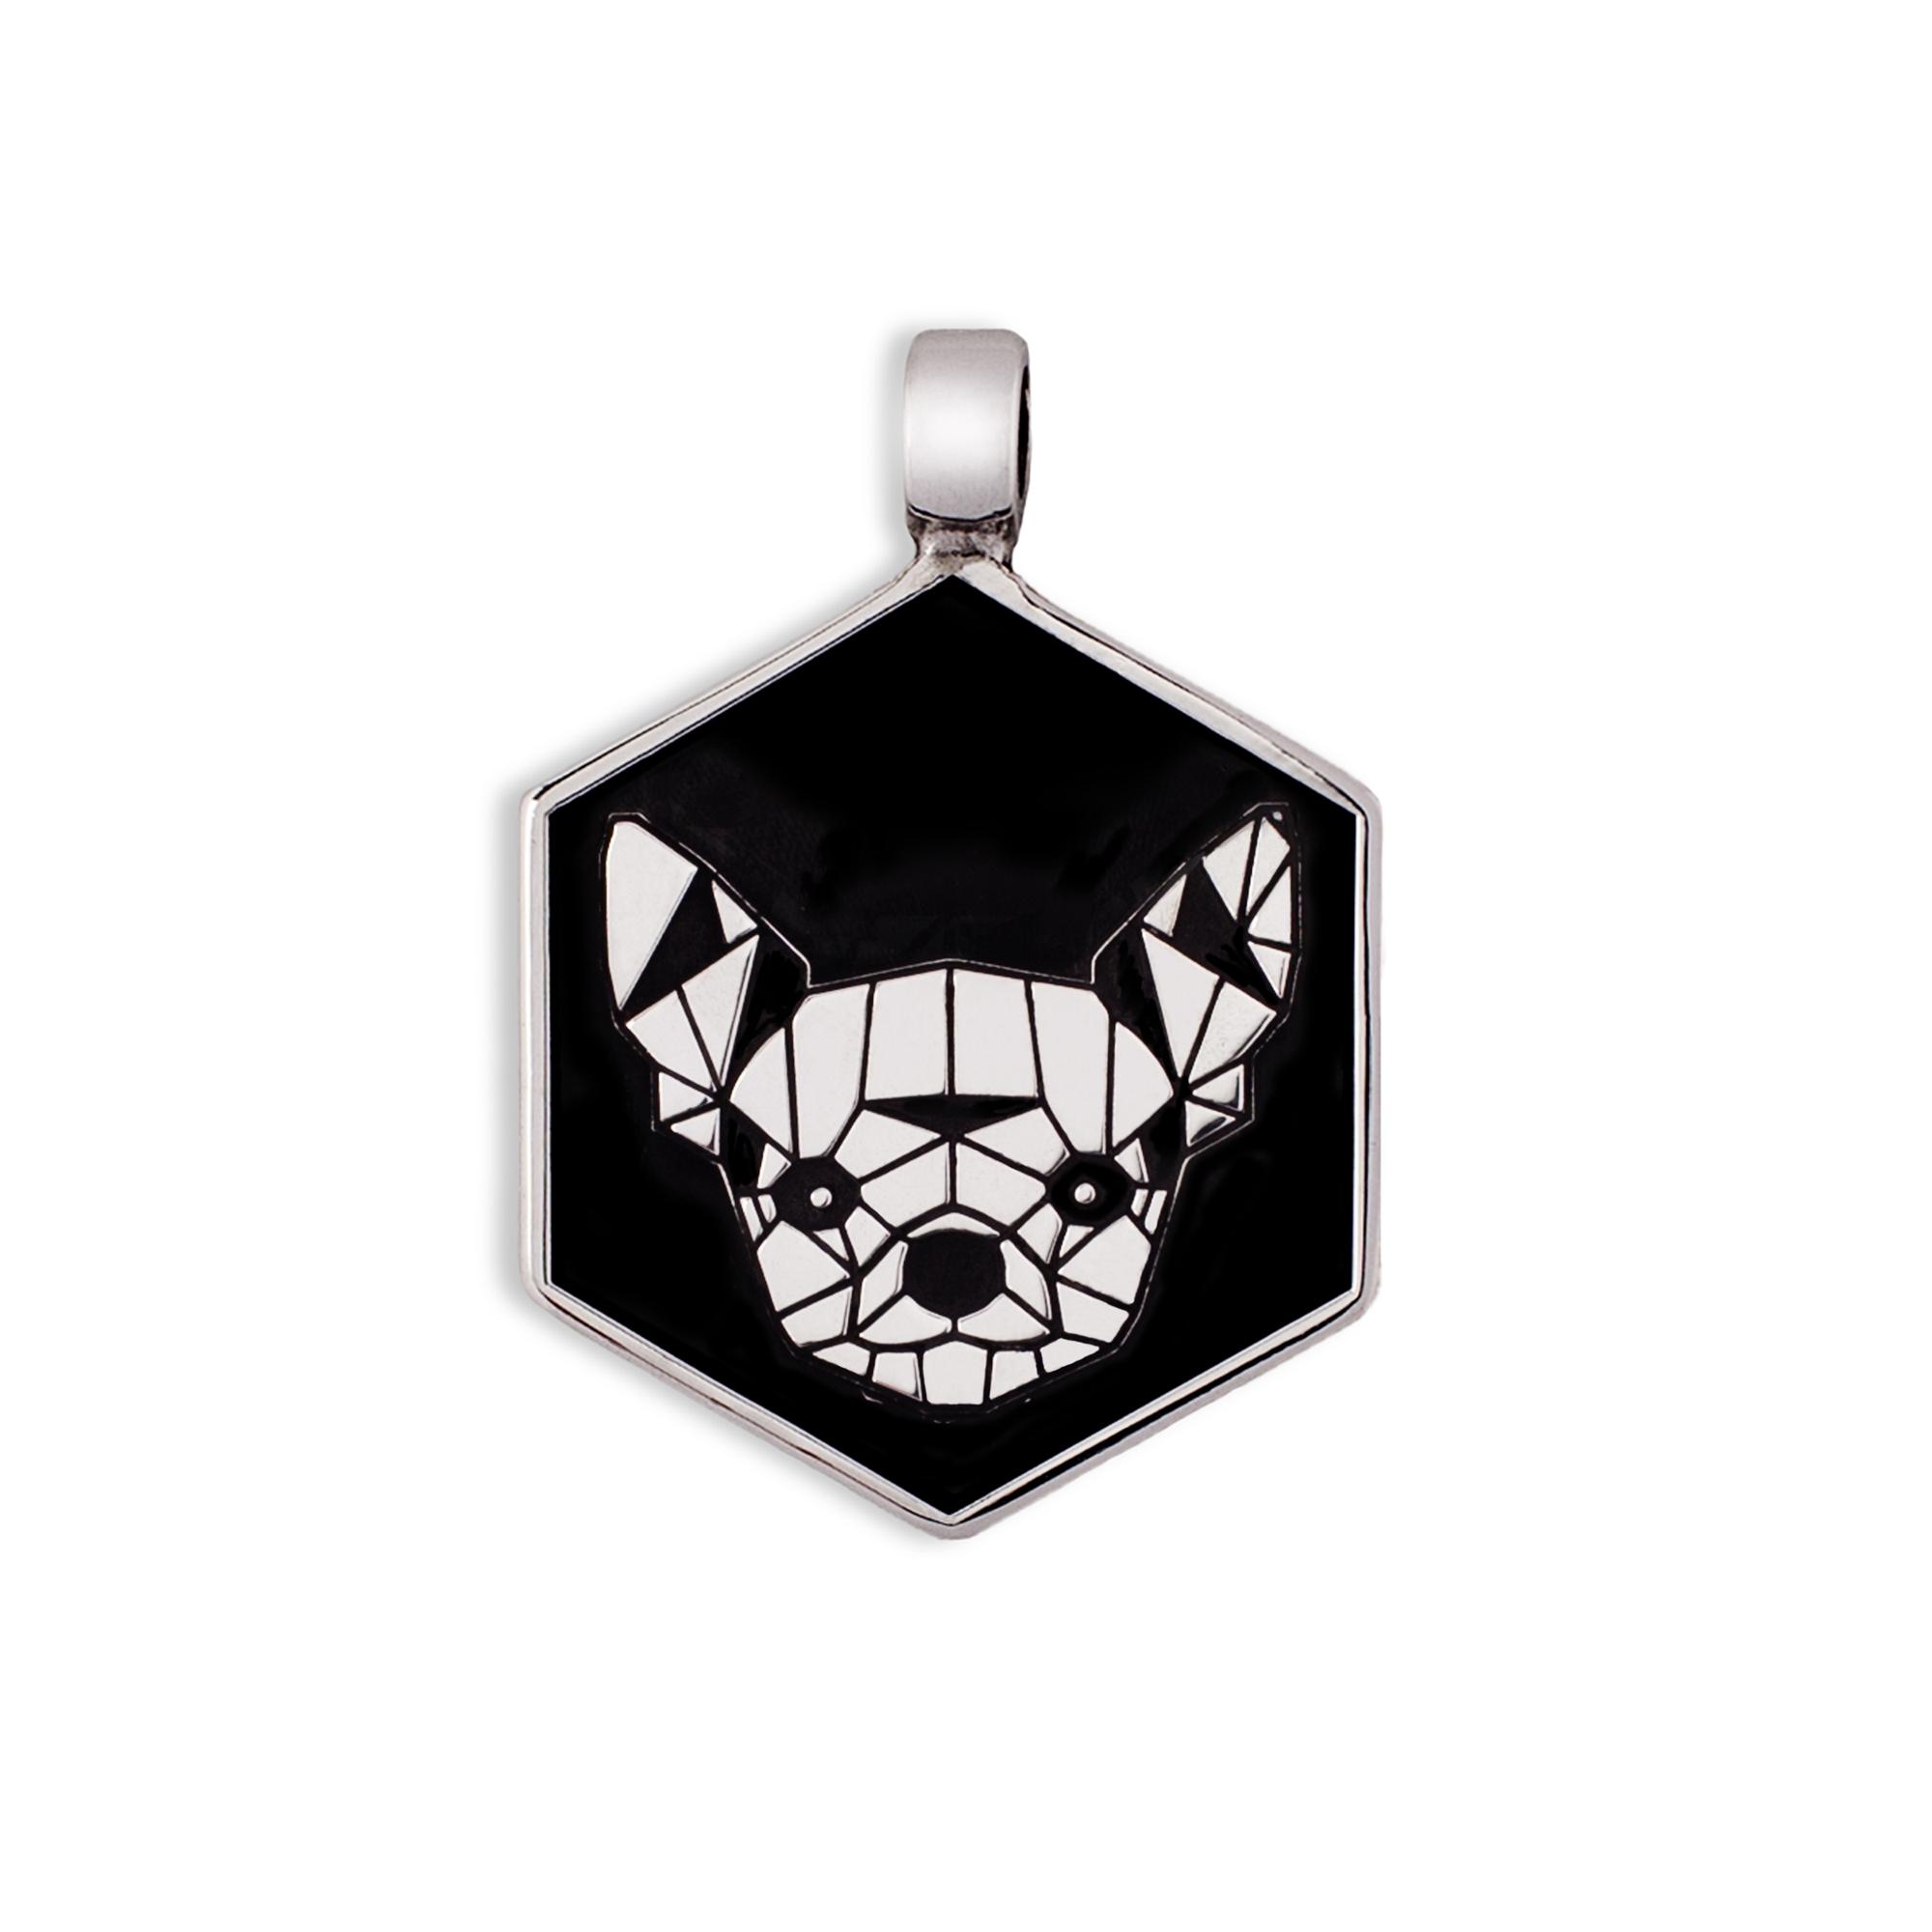 Medaglietta Cane Chihuahua Argento